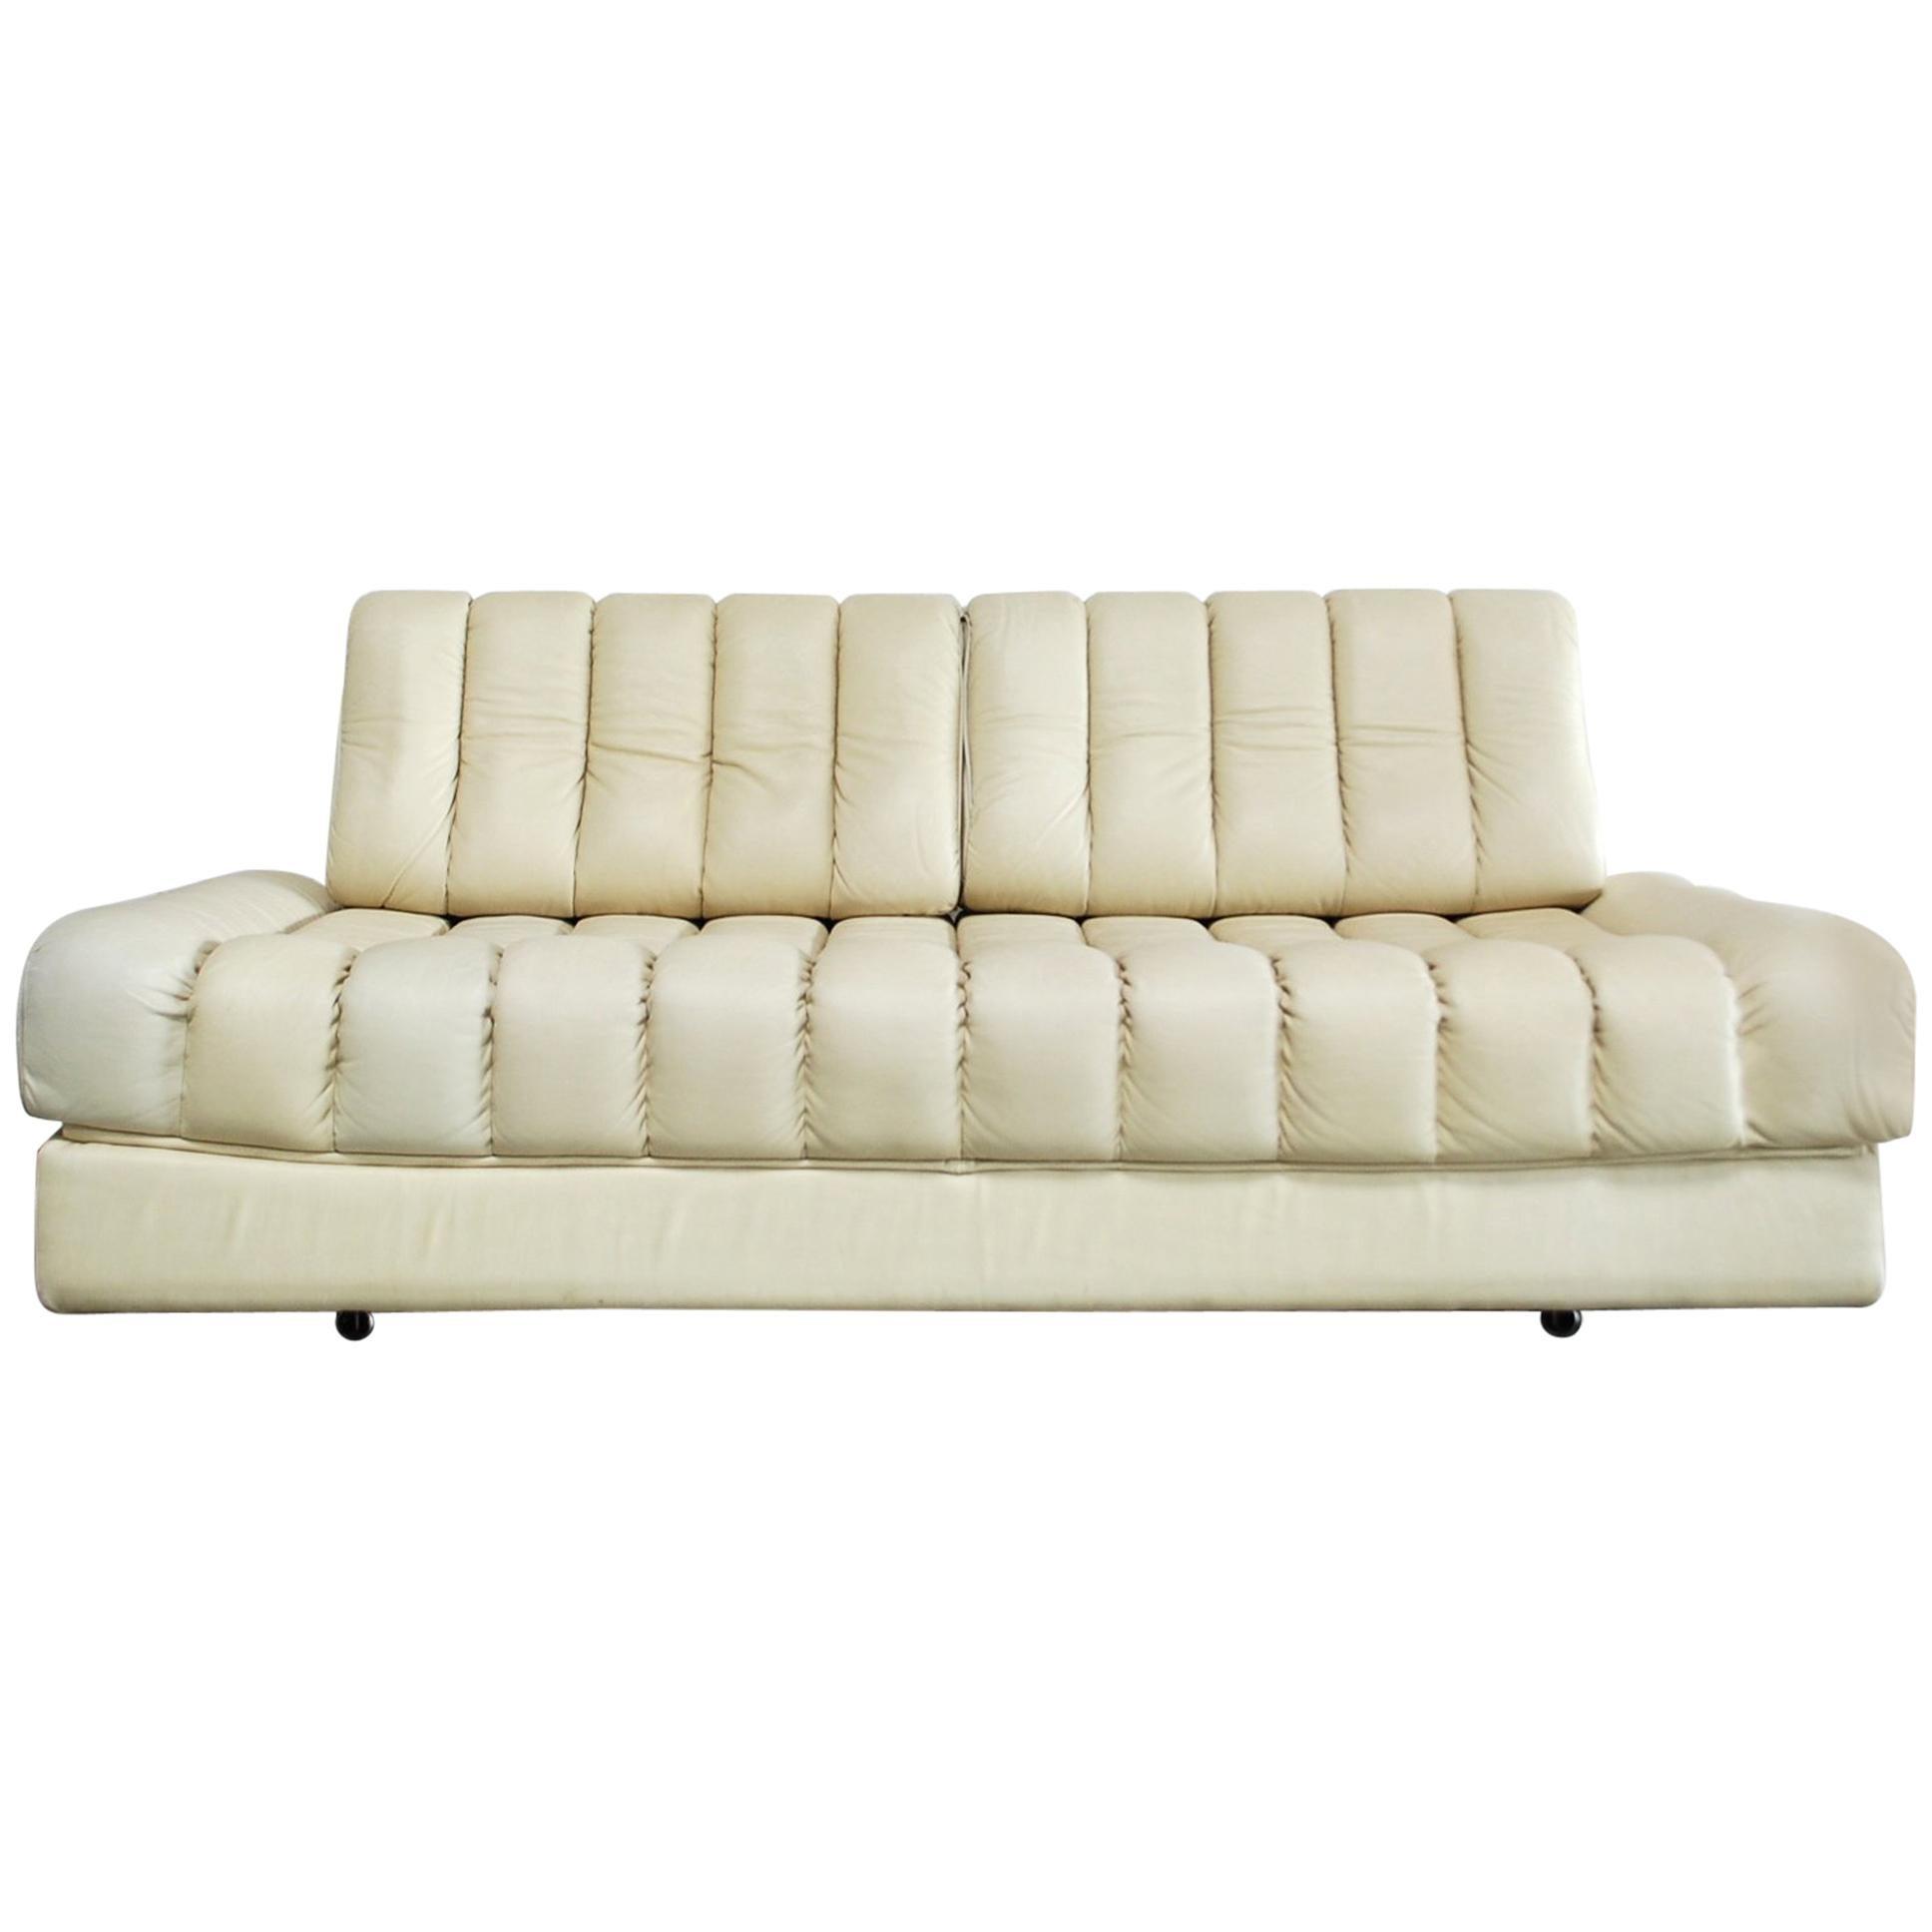 De Sede DS 85 Natural  Daybed Leather Sofa Ecru Crème White